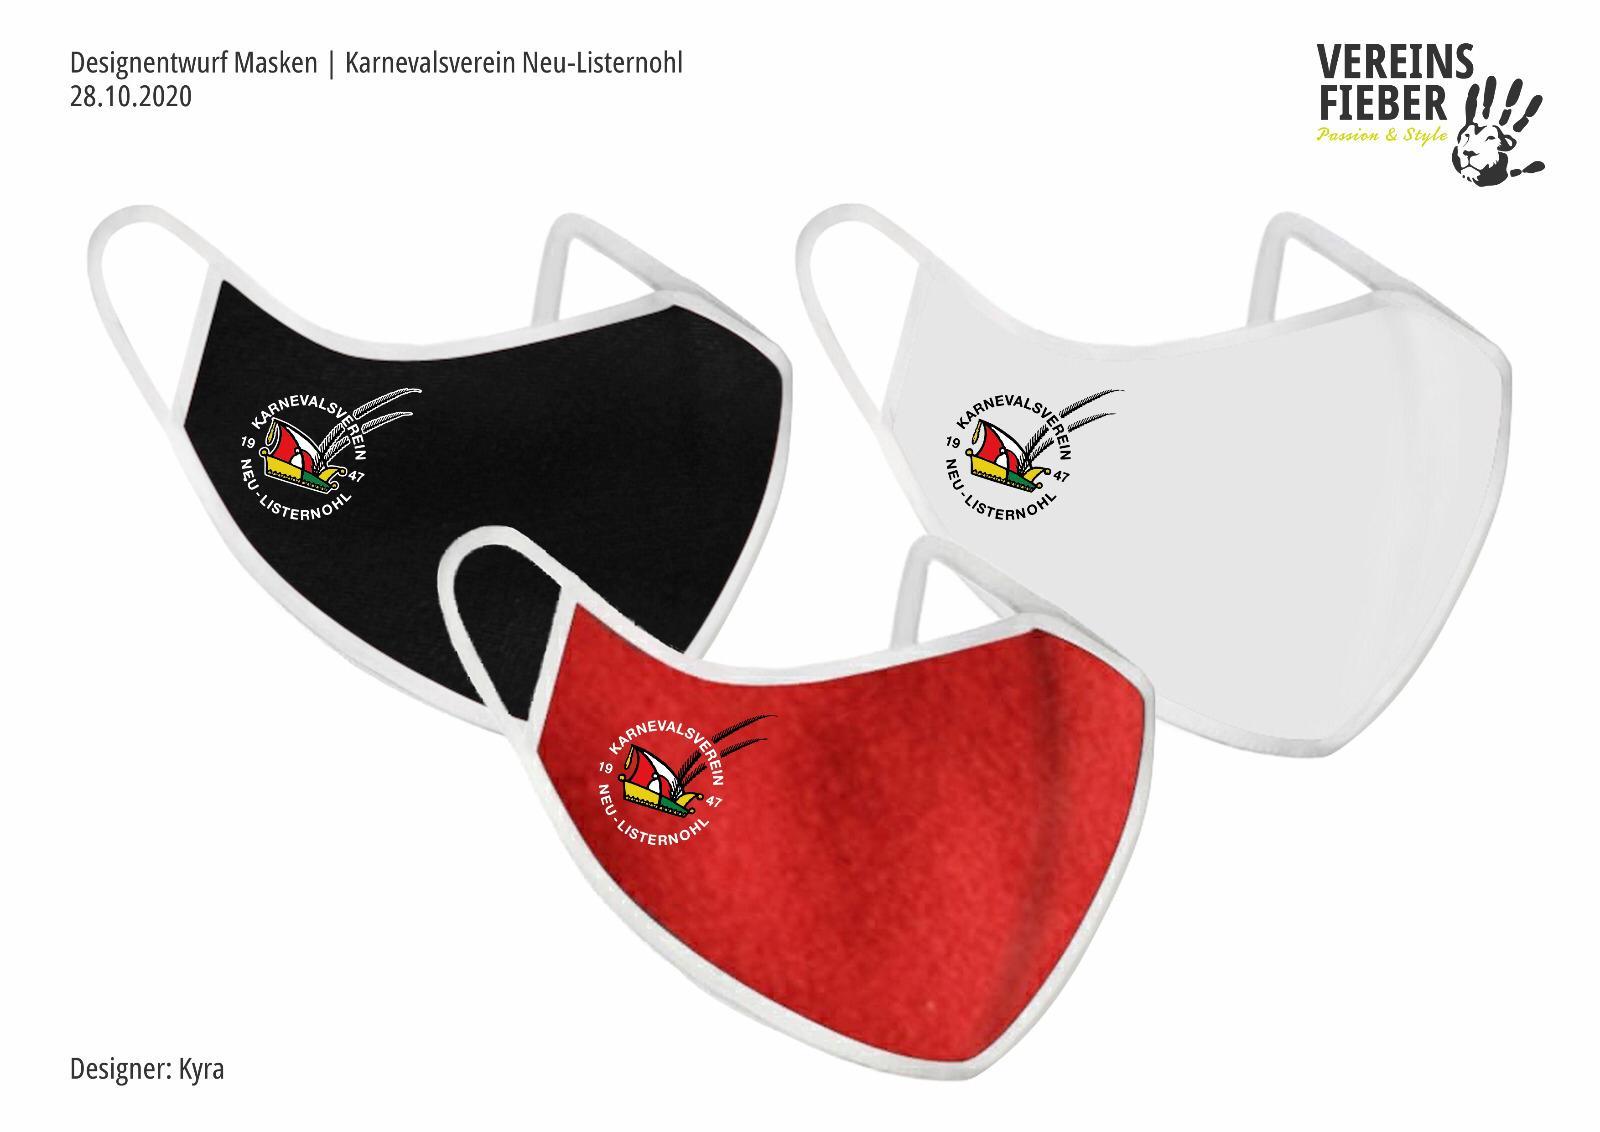 KVNL Vereinsmaske (Mund-Nasenschutz)